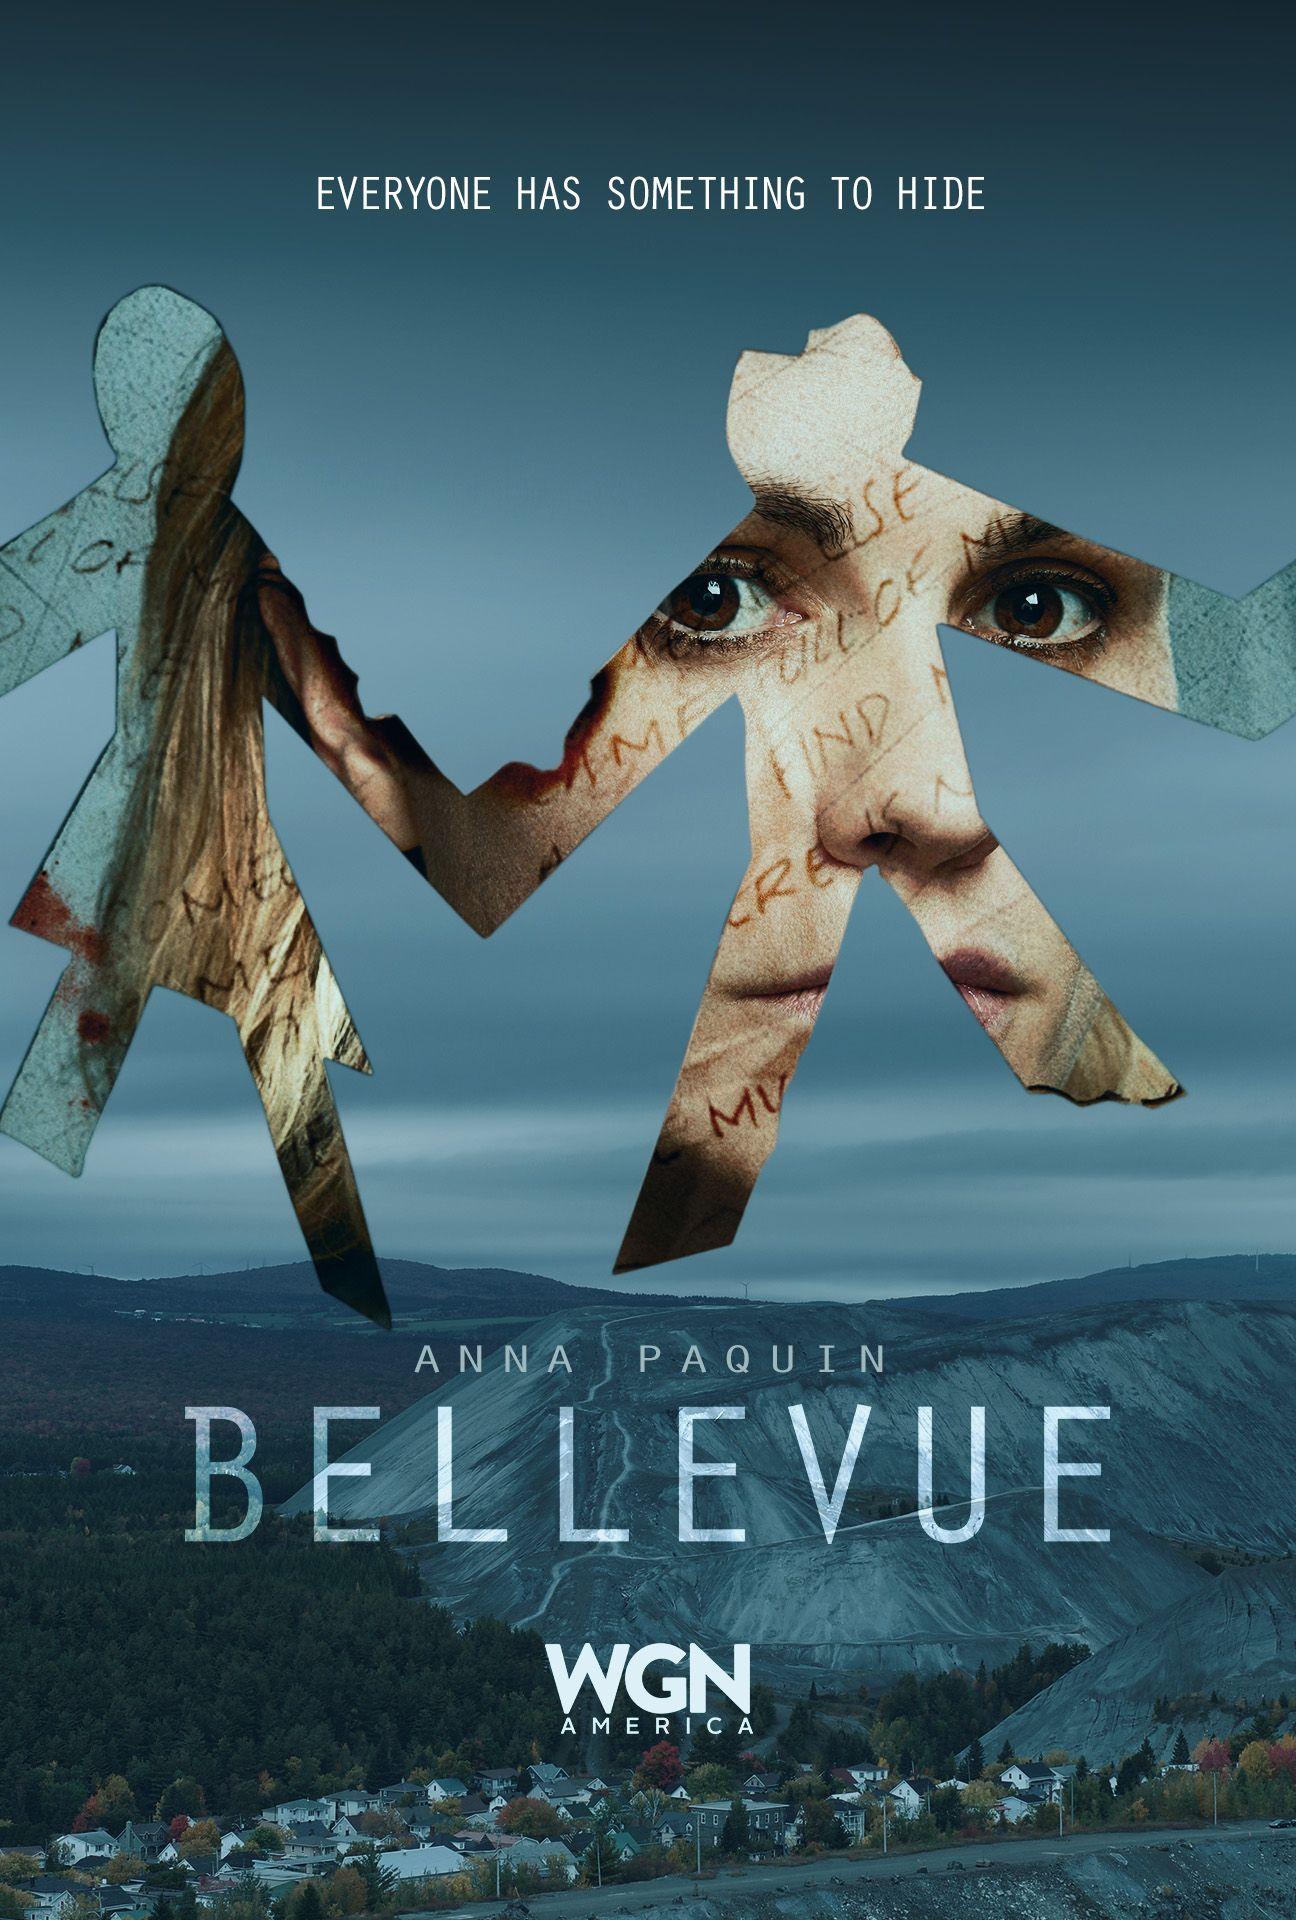 Bellevue imdb